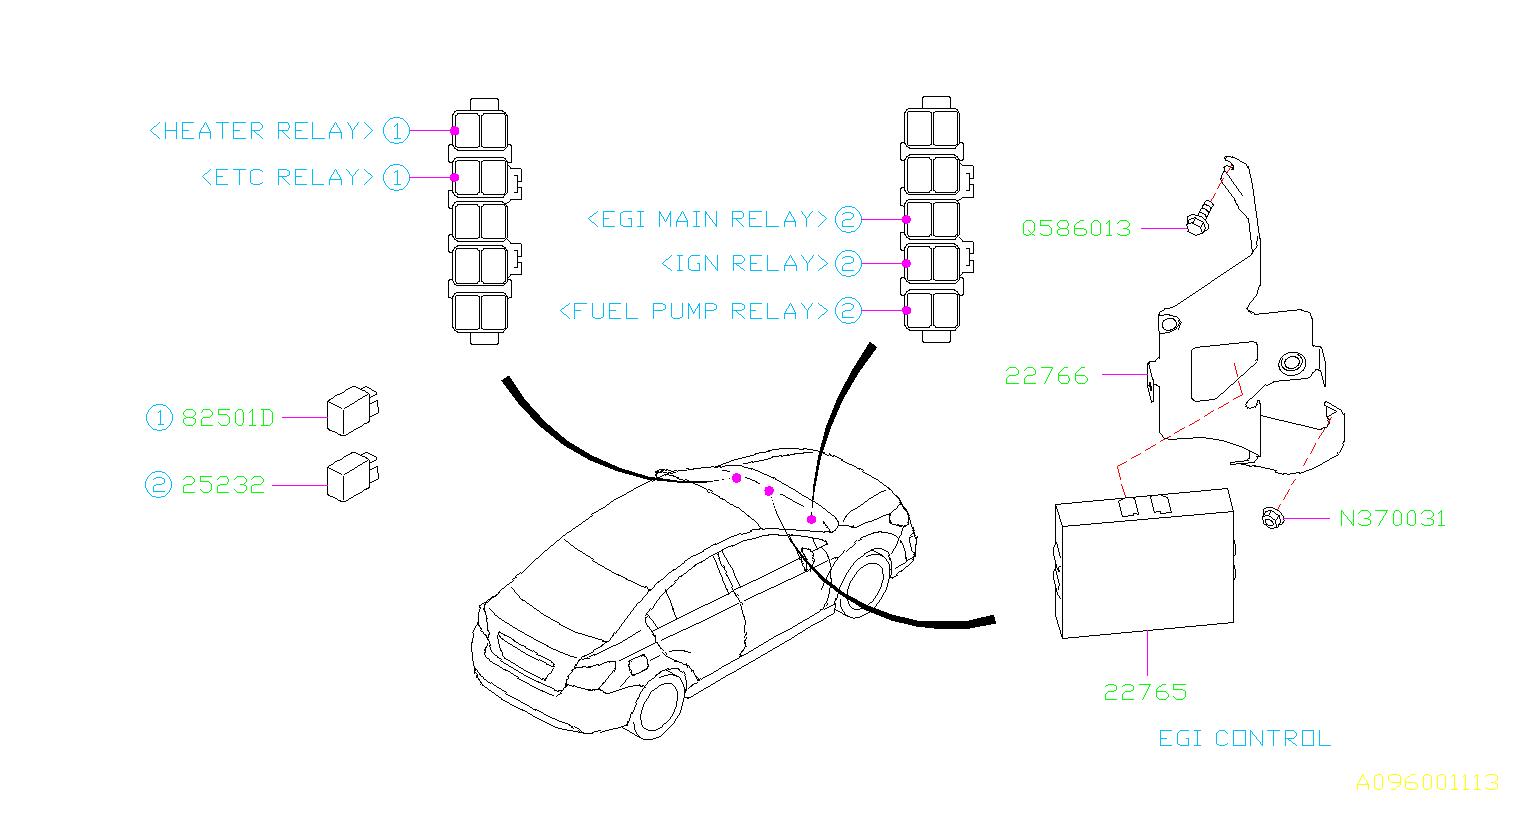 Subaru Impreza Engine Control Module